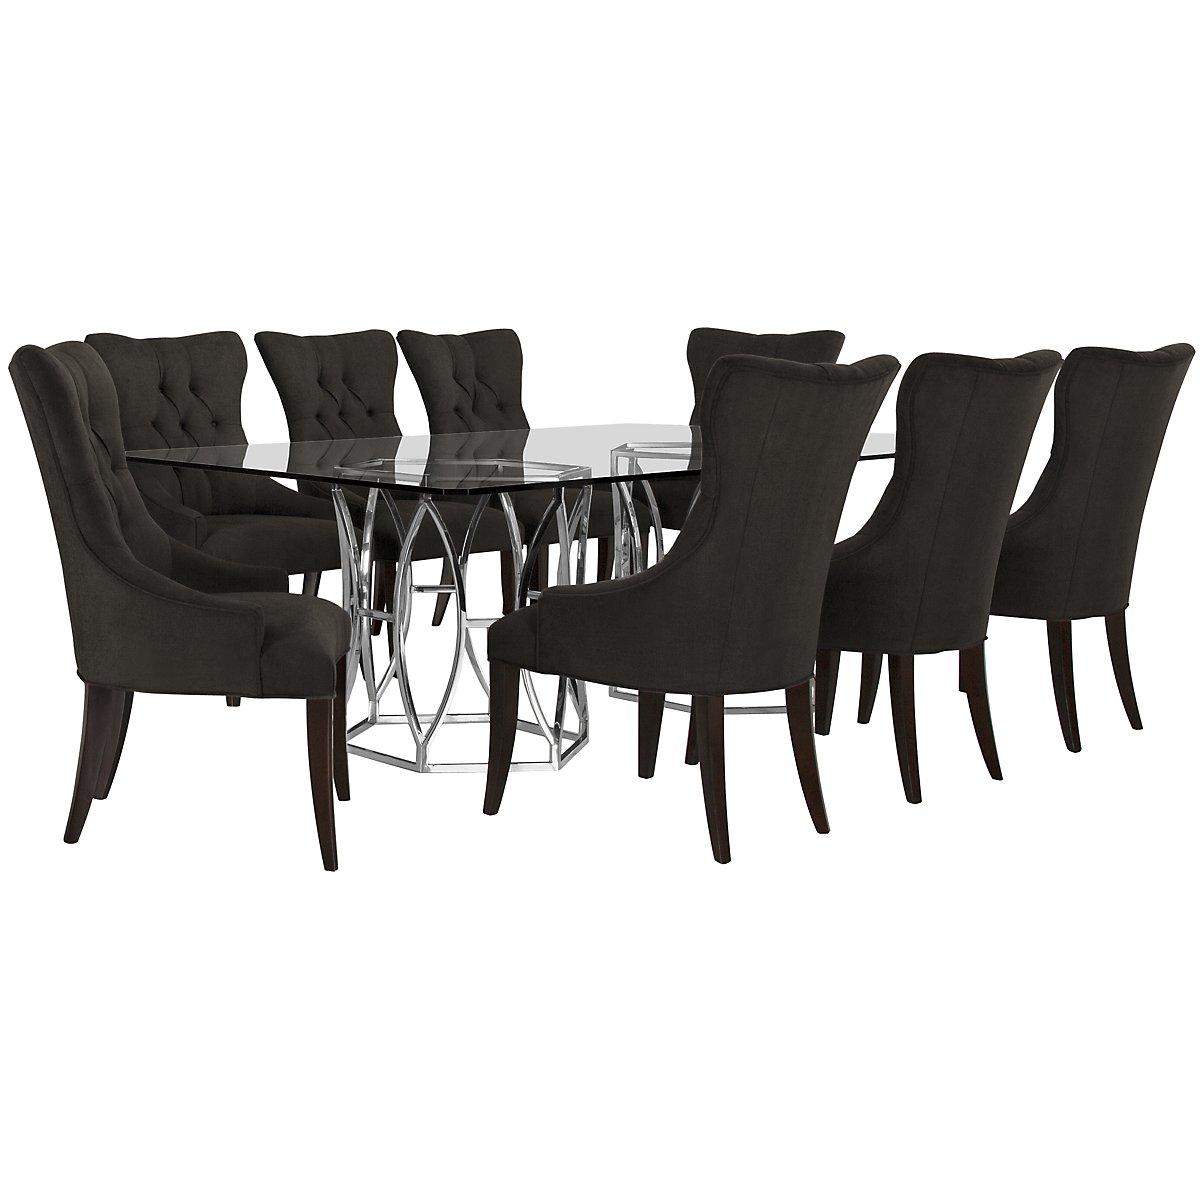 Argent Dark Gray Rectangular Table & 4 Upholstered Chairs